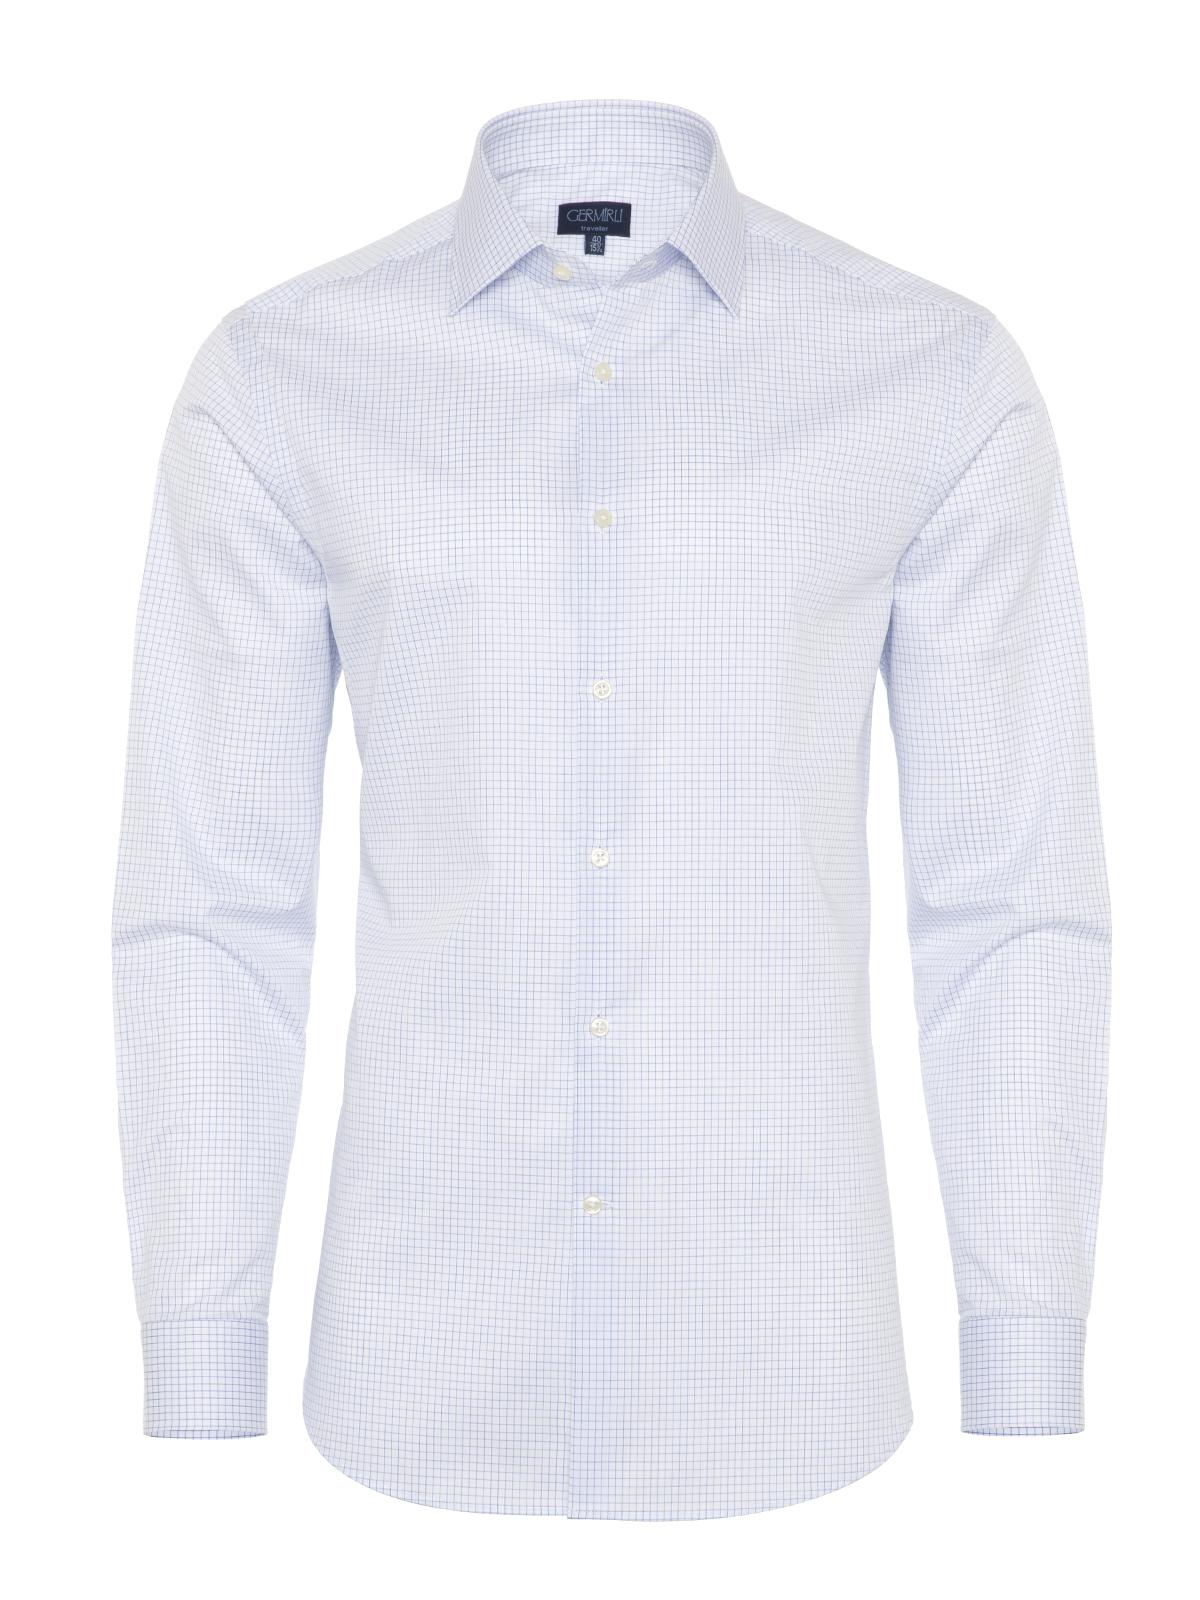 Germirli - Germirli Non Iron Navy Blue Plaid Semi Spread Tailor Fit Shirt